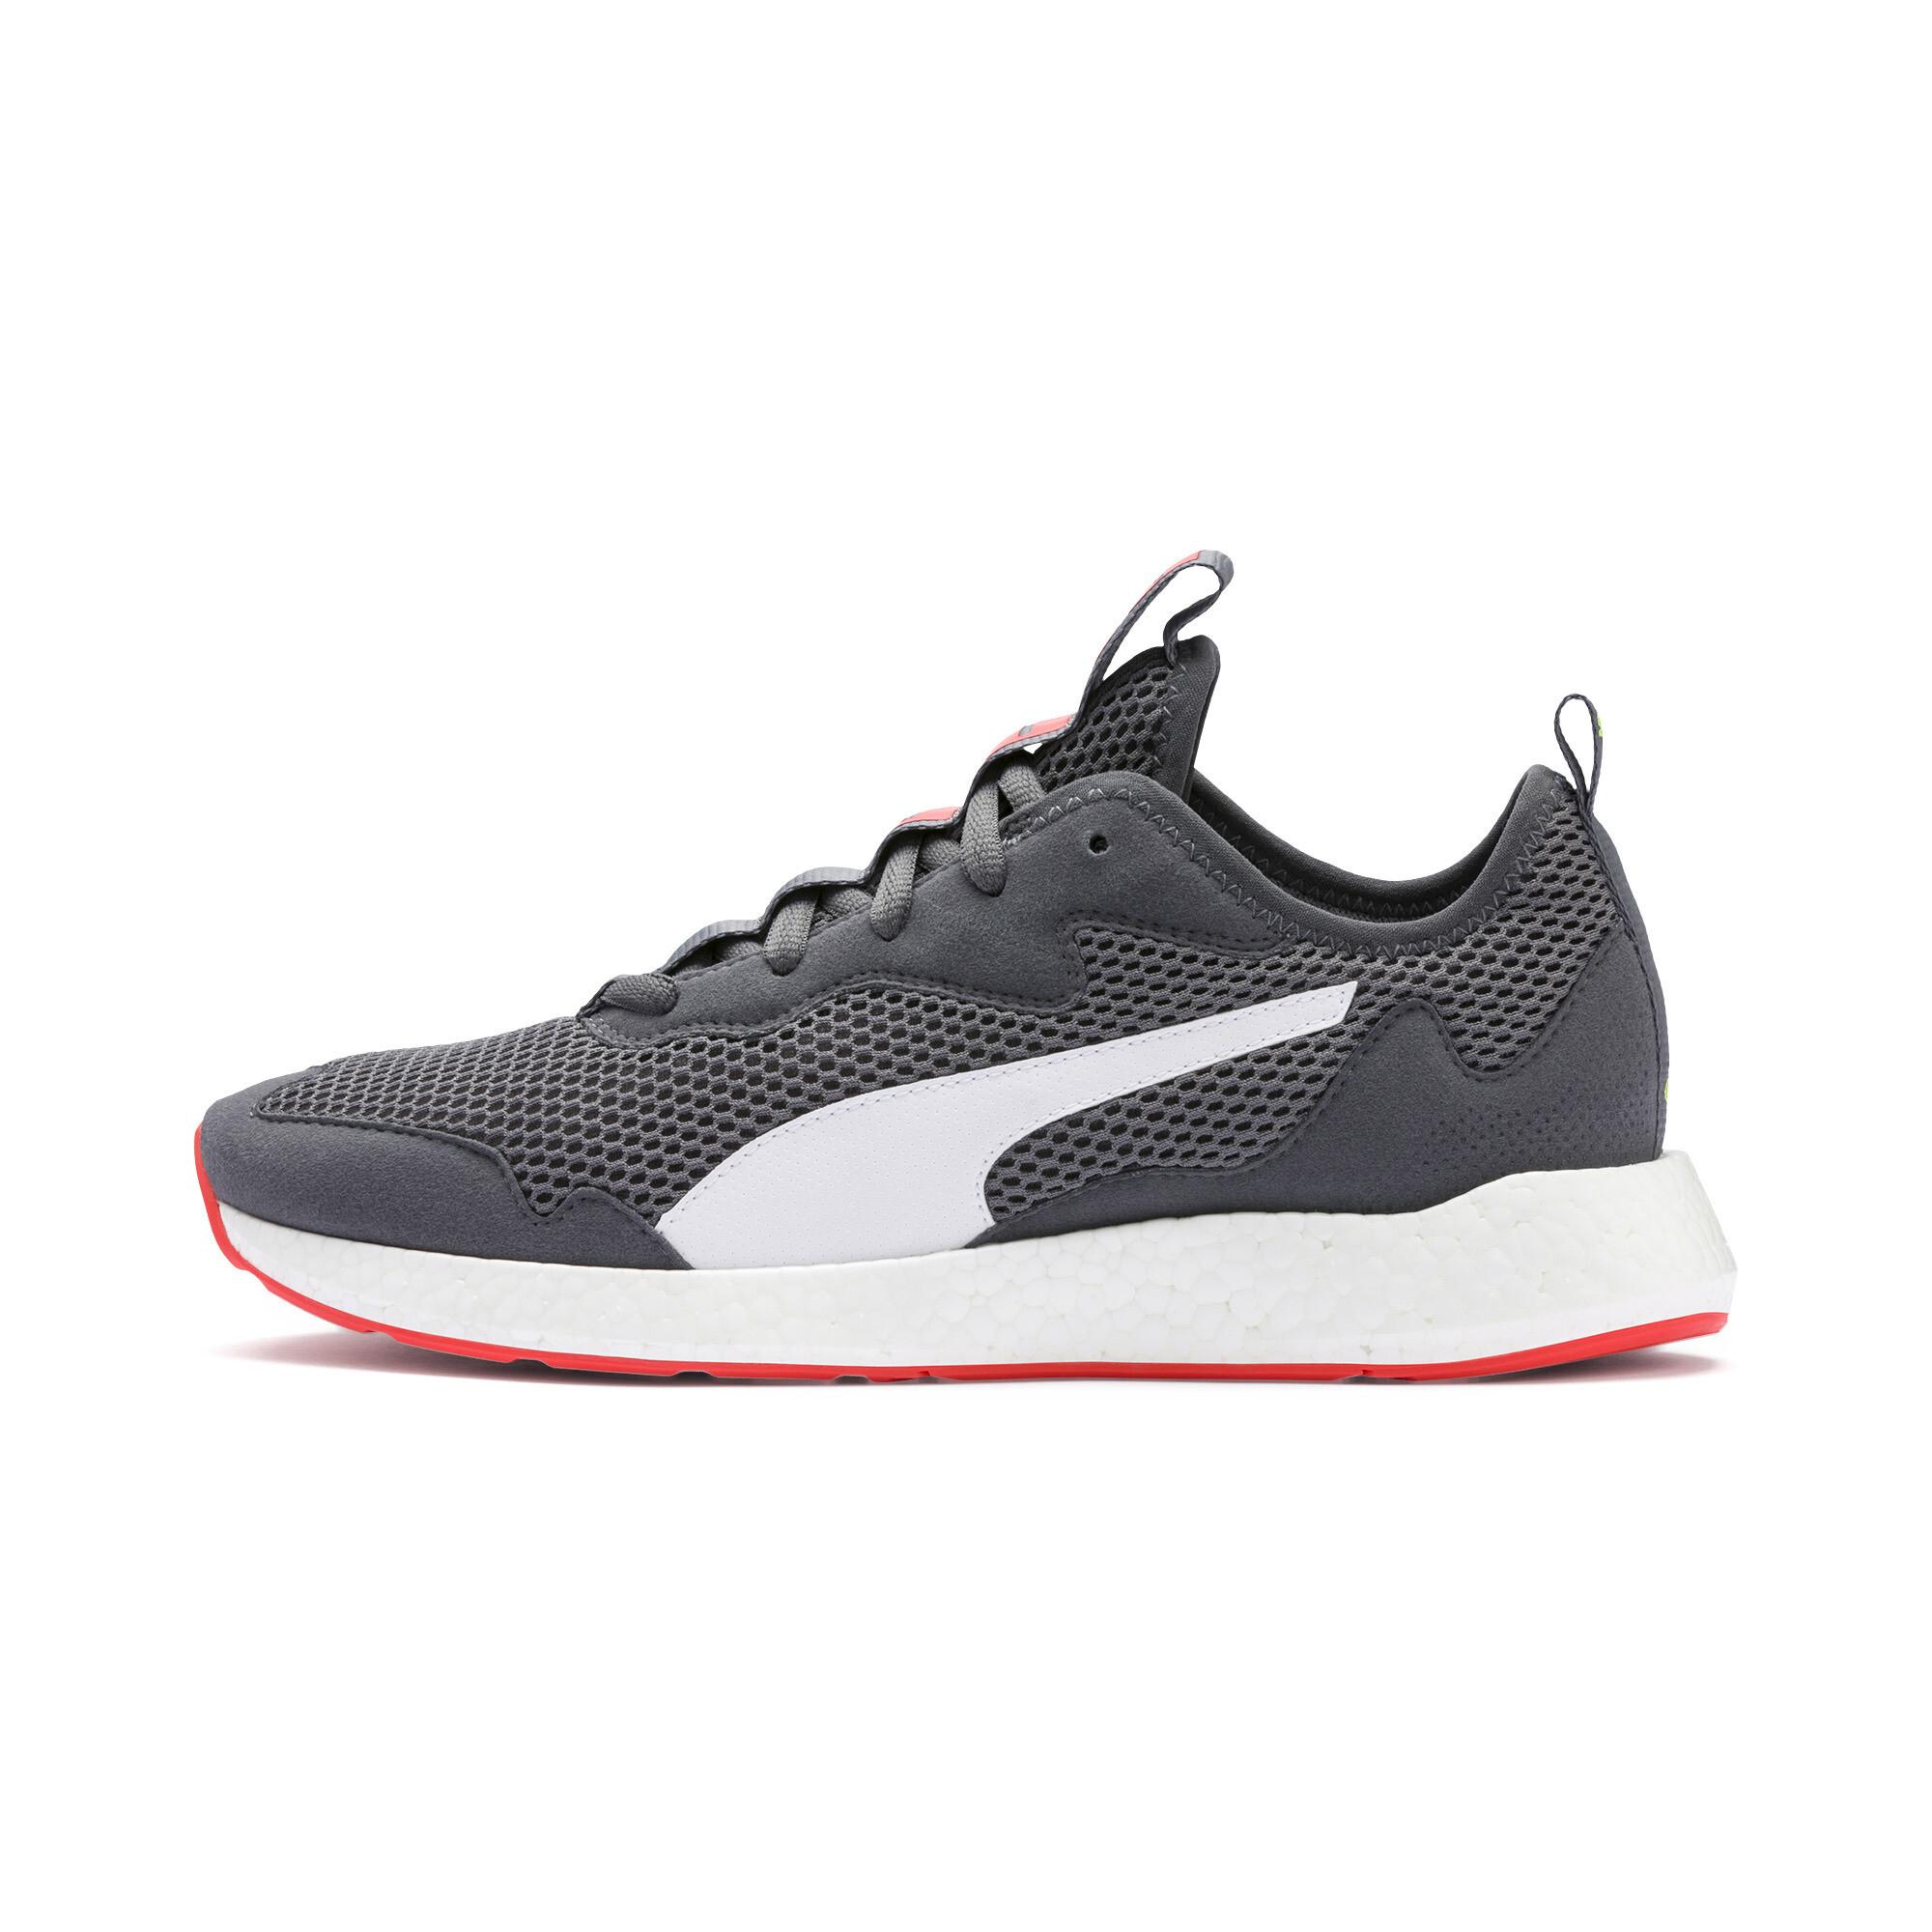 PUMA-NRGY-Neko-Skim-Men-s-Running-Shoes-Men-Shoe-Running thumbnail 9